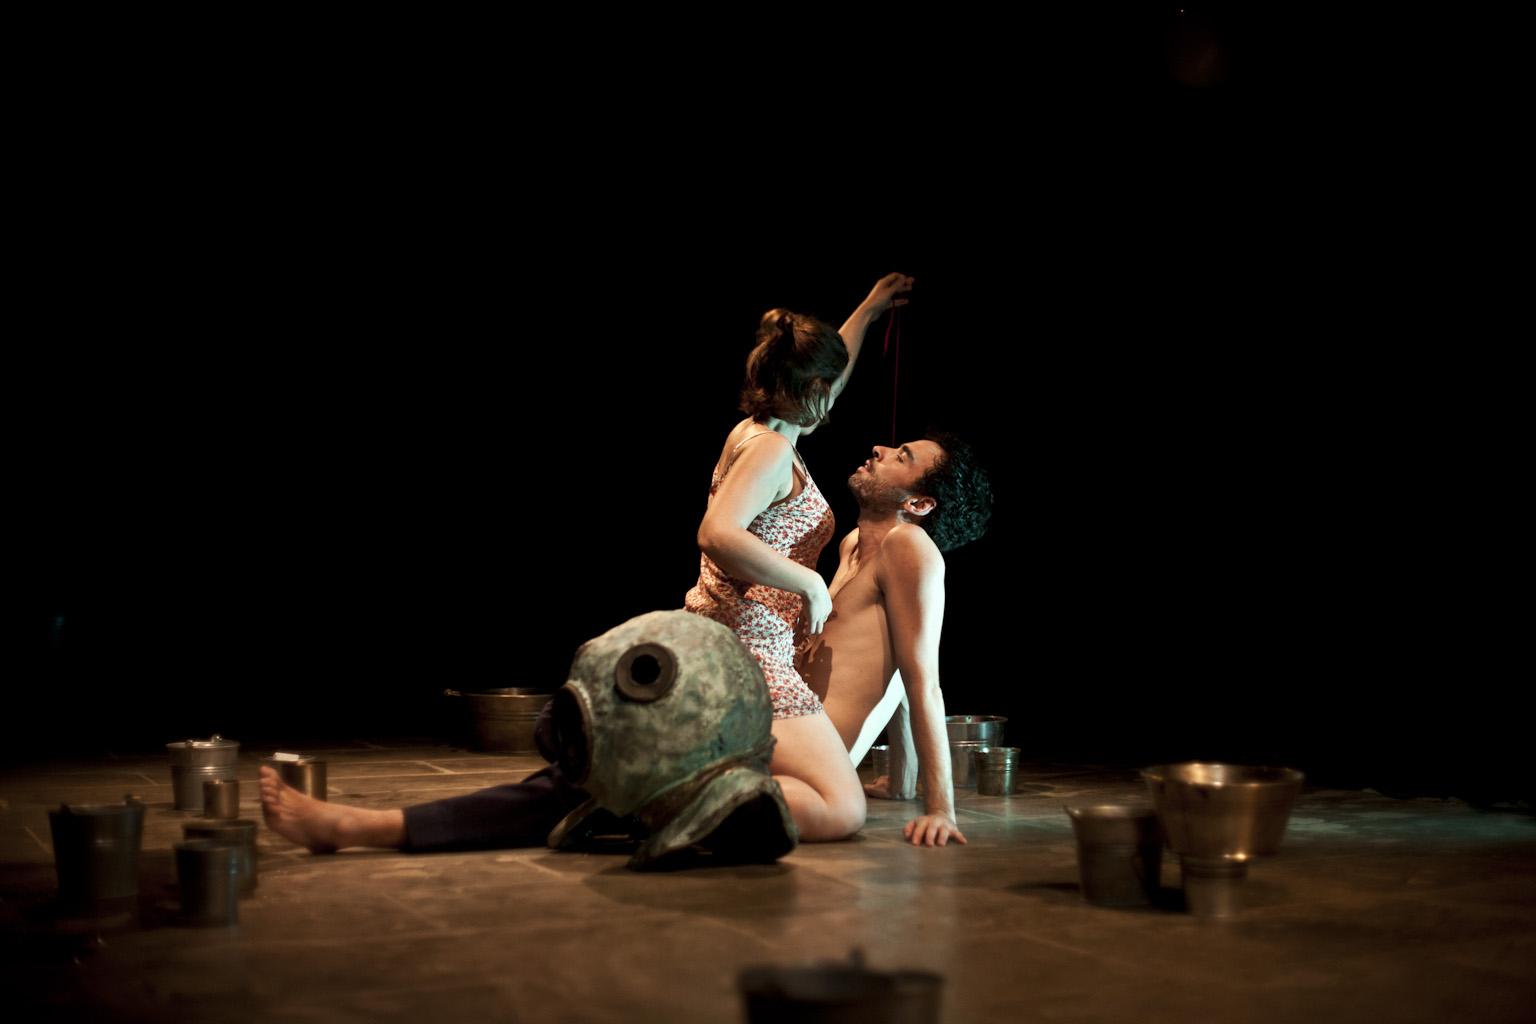 INTERIOR CON GOTERAS, Teatro